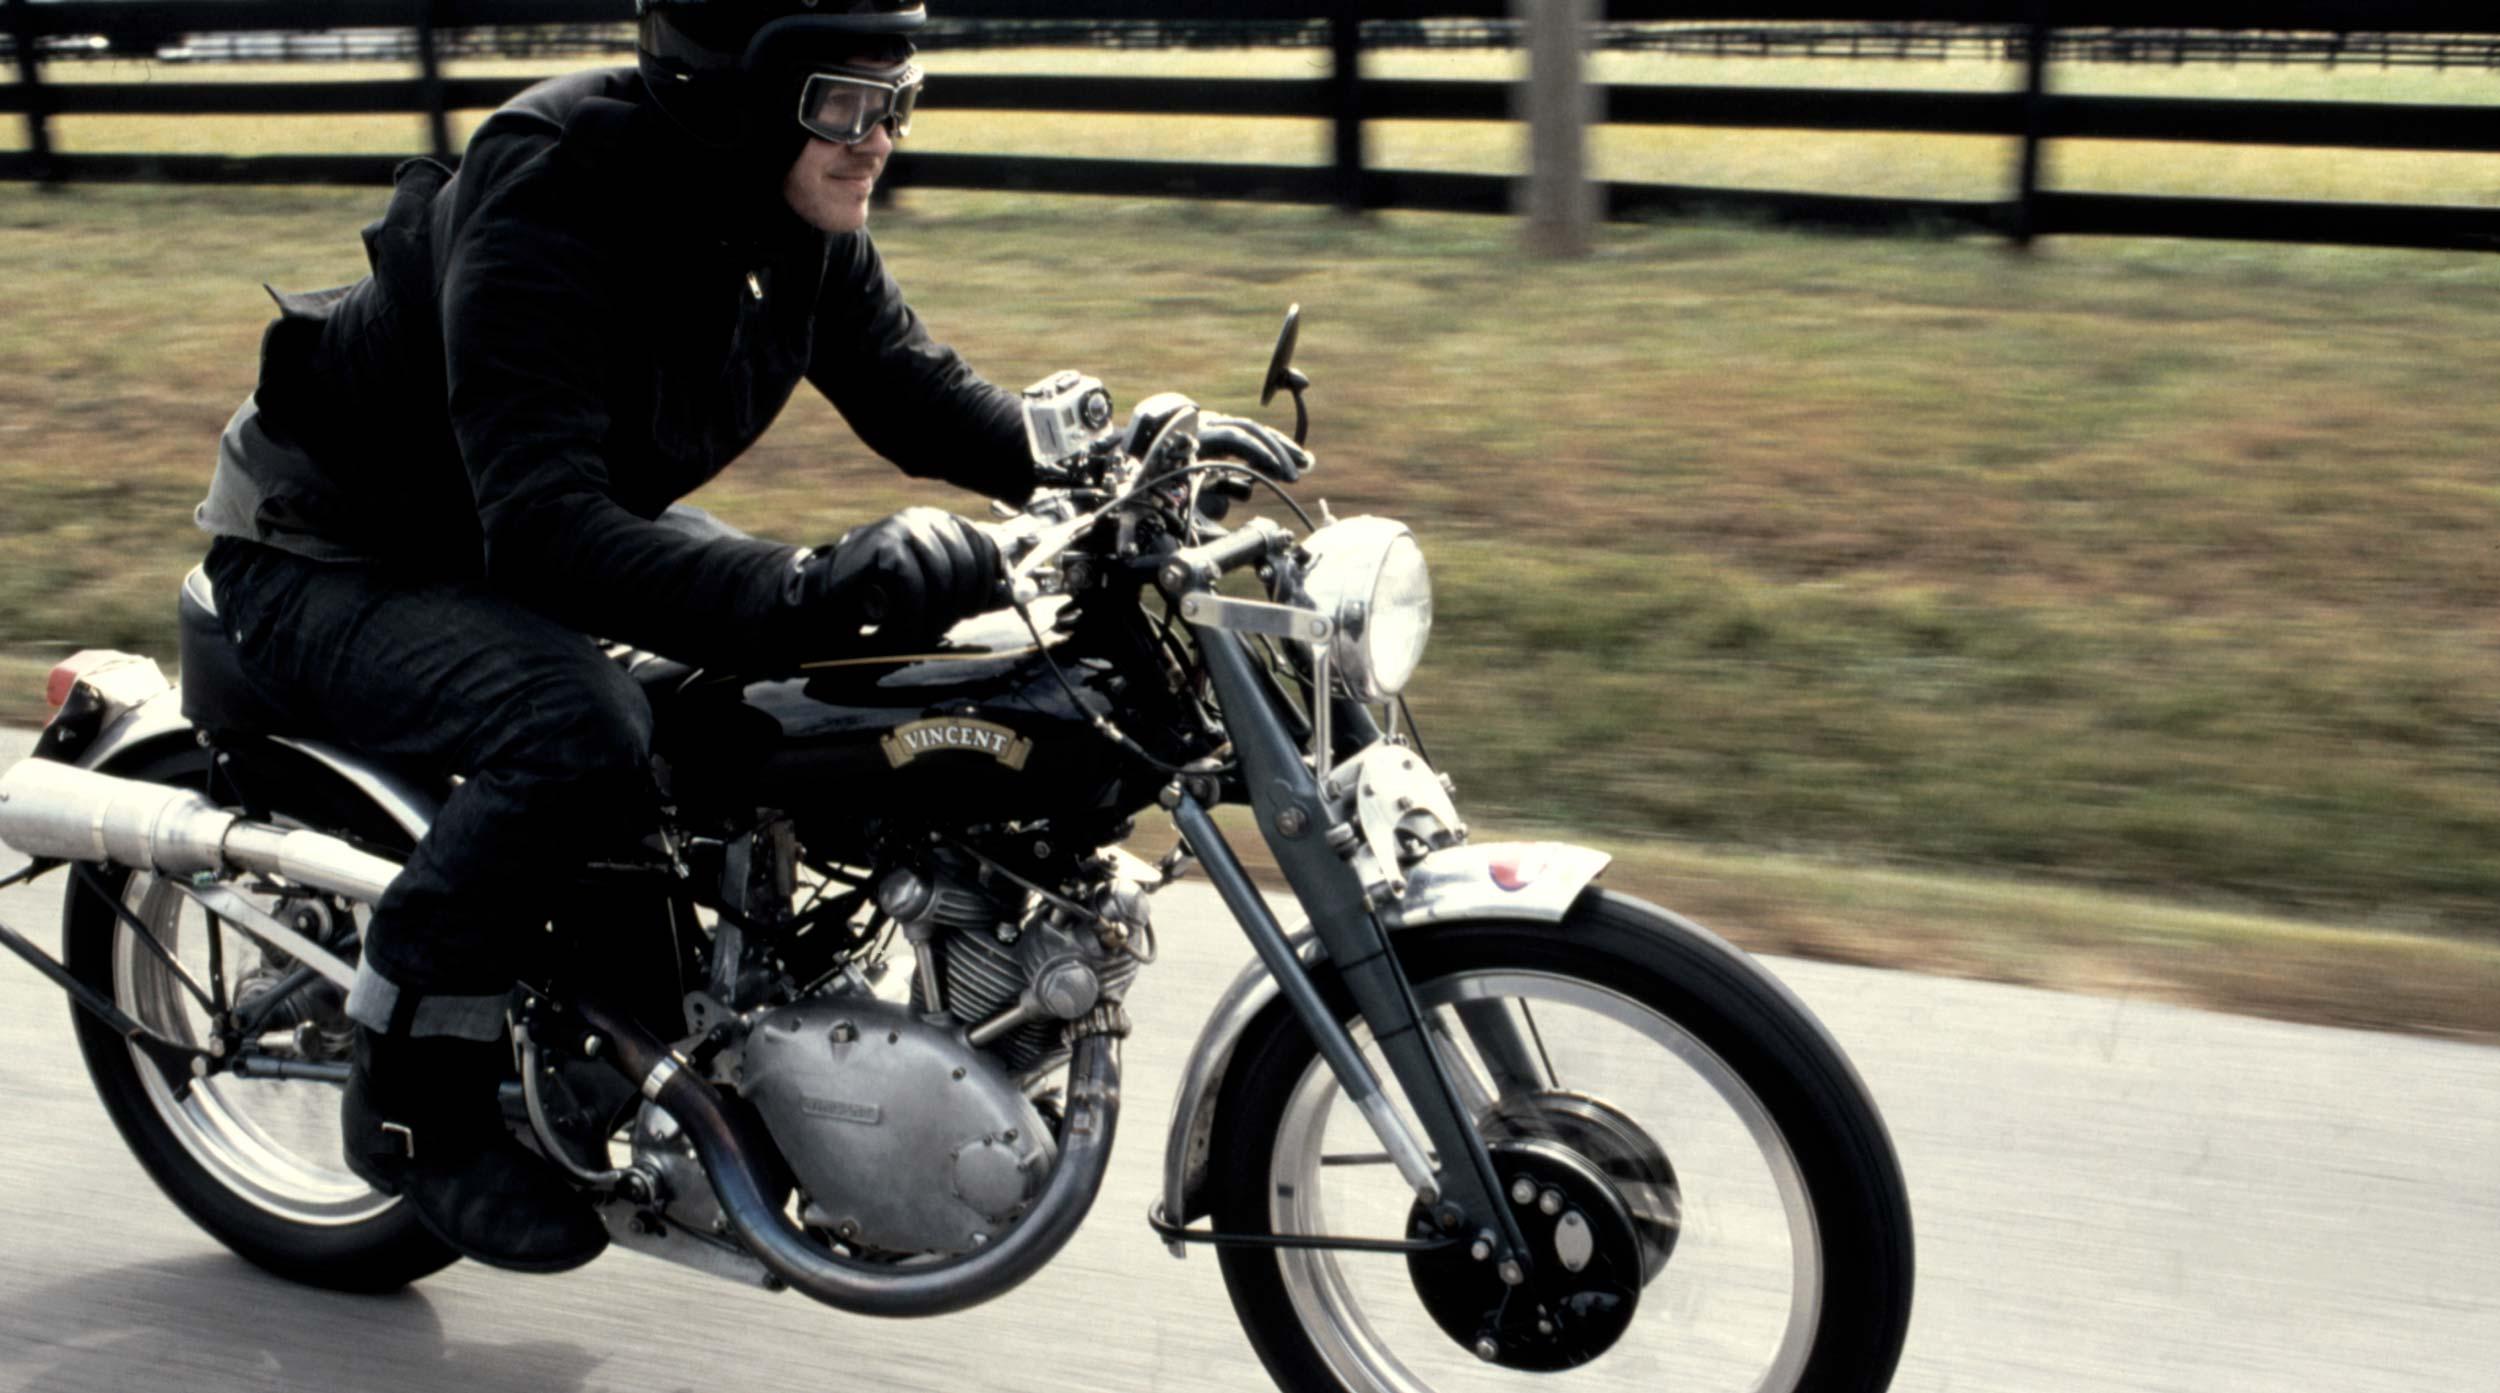 Ian_Ride.jpg